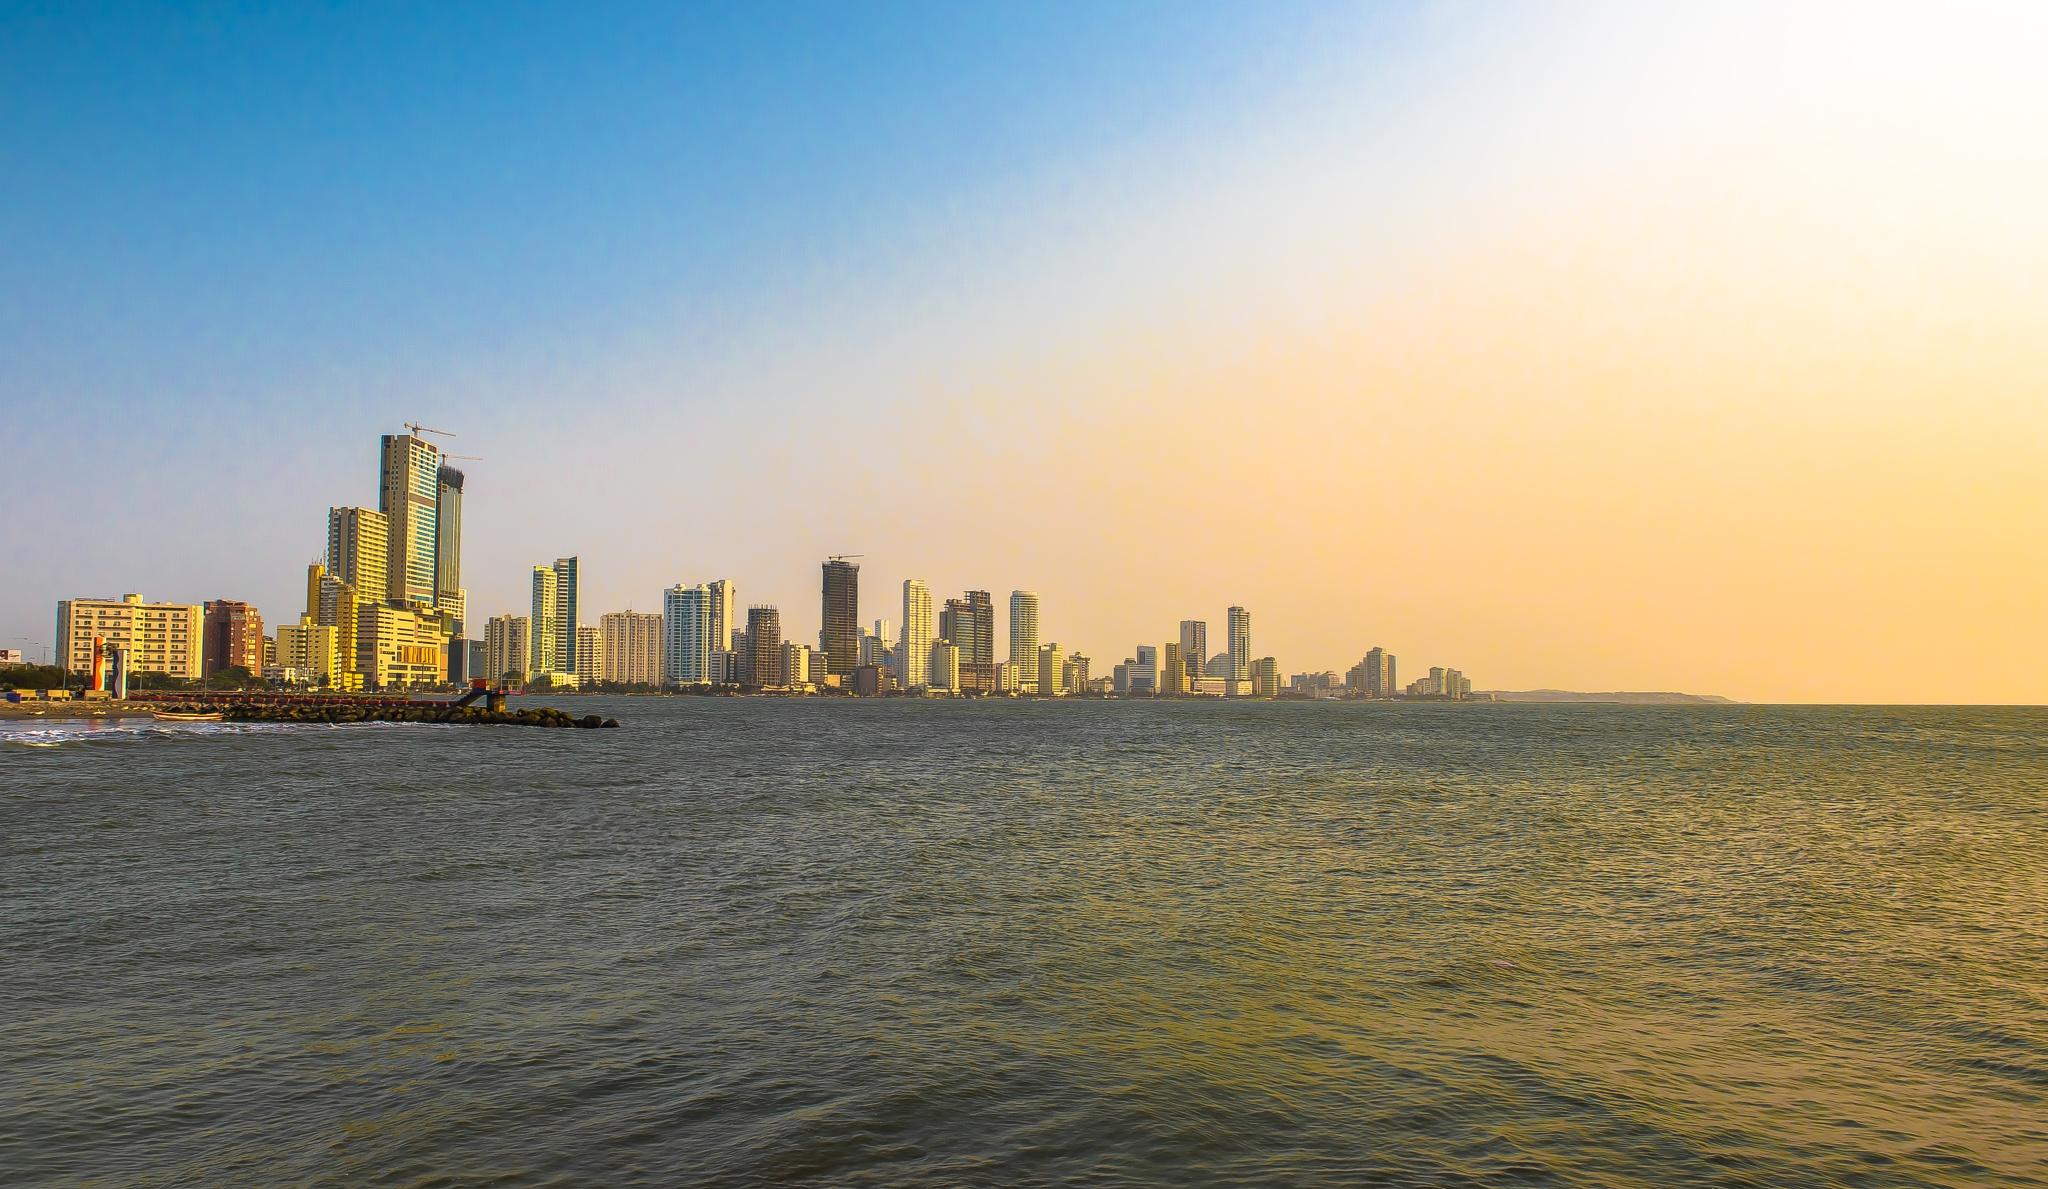 Cartagena Skyline at 6pm by SAFIRE PHOTO